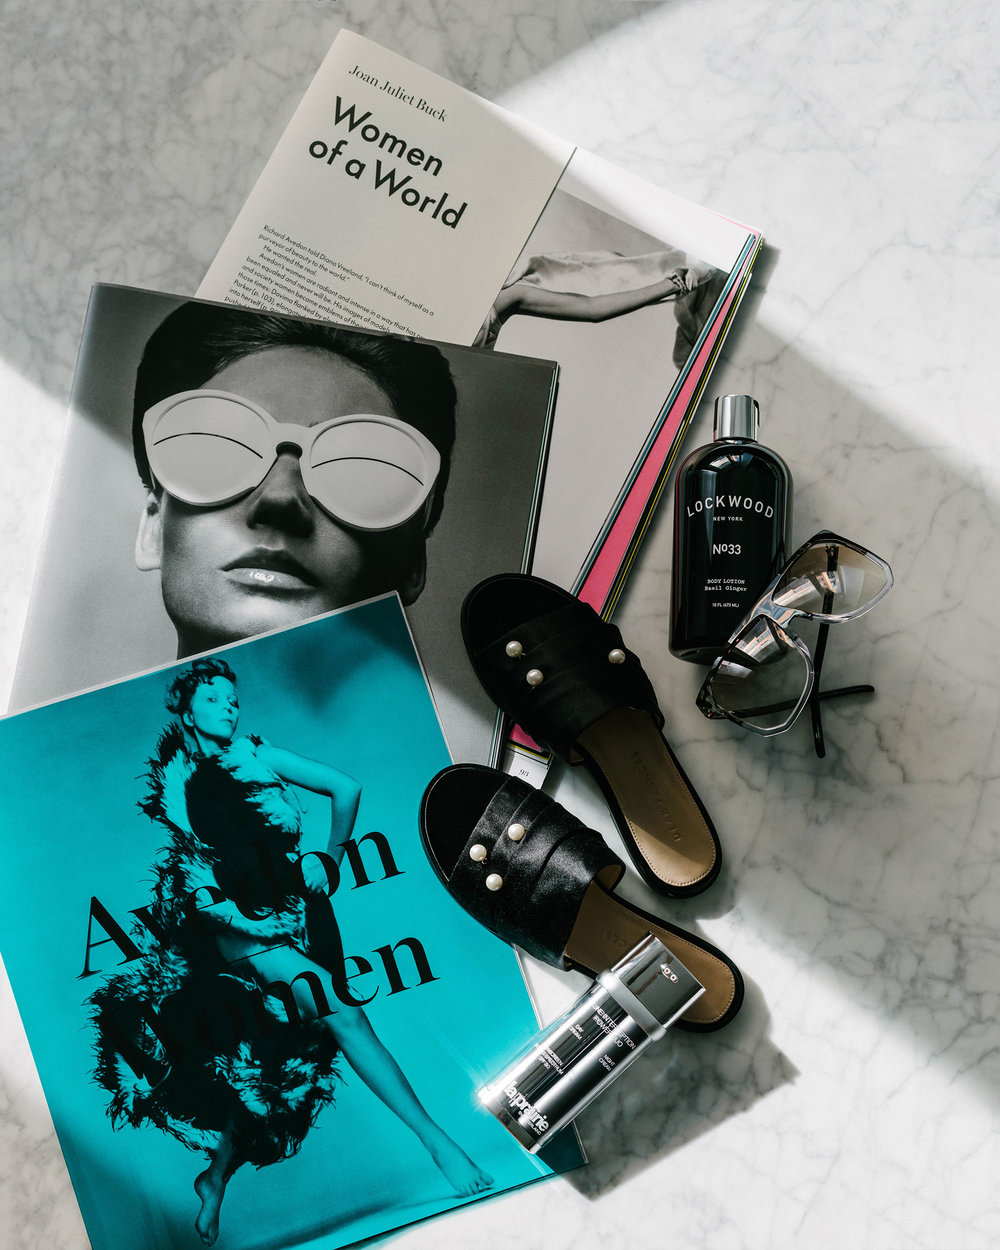 Avedon Women, Lockwood New York Lotion, Loewe Sunglasses, Dear Frances Sandals, La Prairie Cream